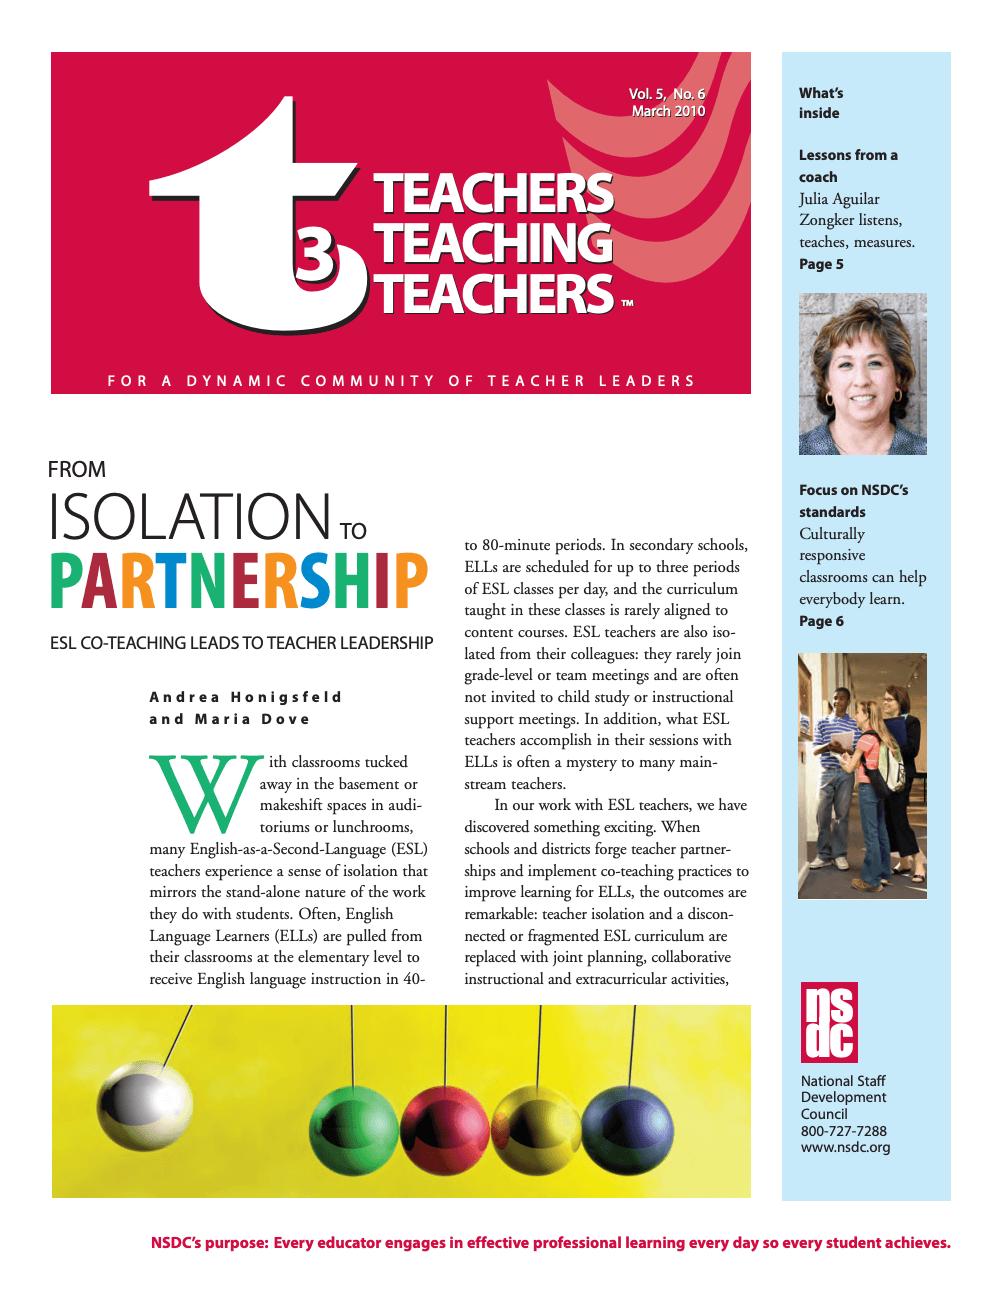 teachers-teaching-teachers-march-2010-vol-5-no-6